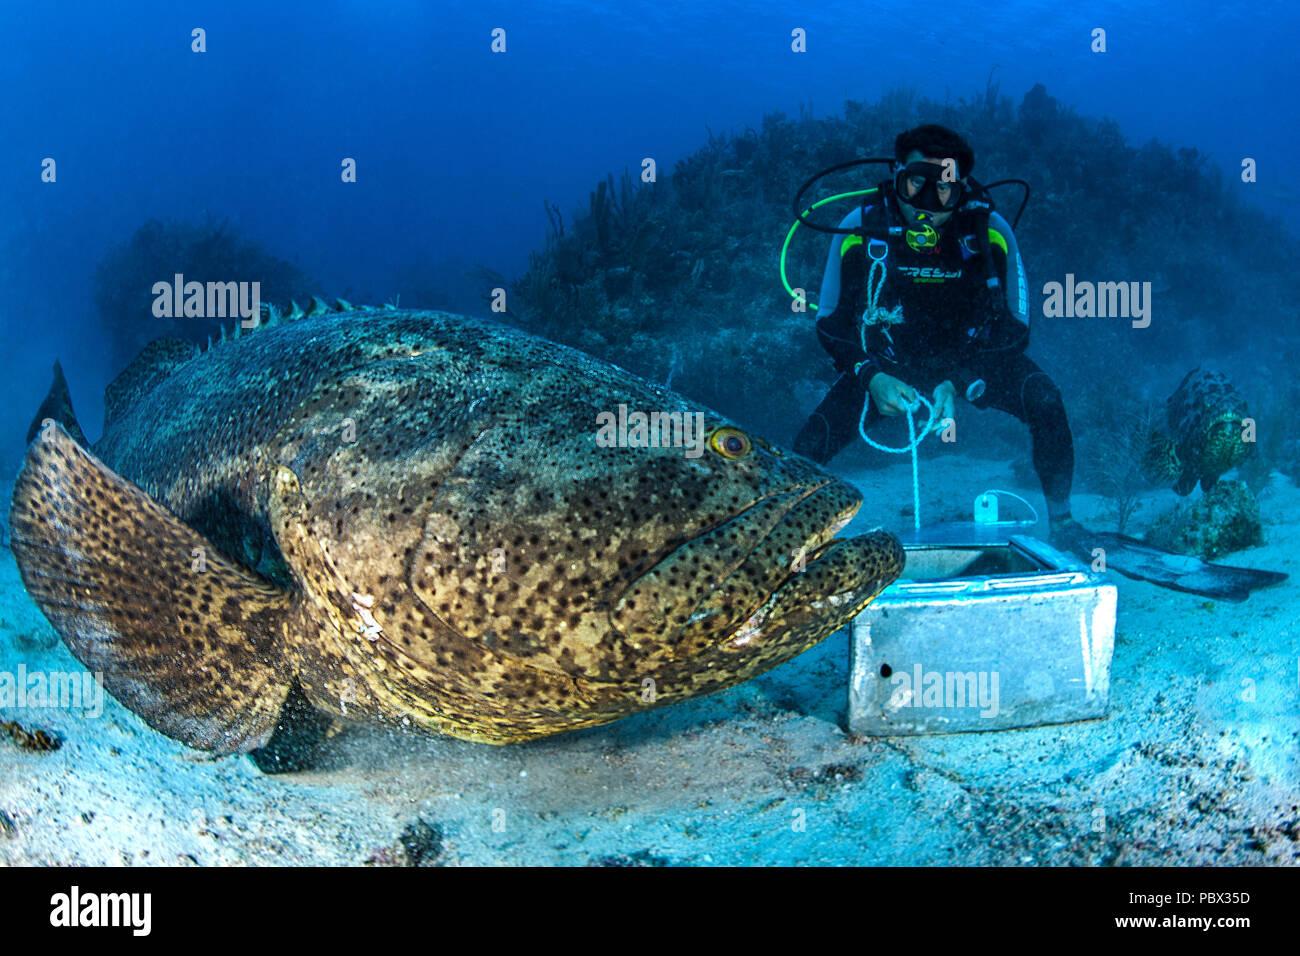 Goliath Grouper Epinephelus Itajara And Diver Jardines De La Reina National Park Cuba Stock Photo Alamy